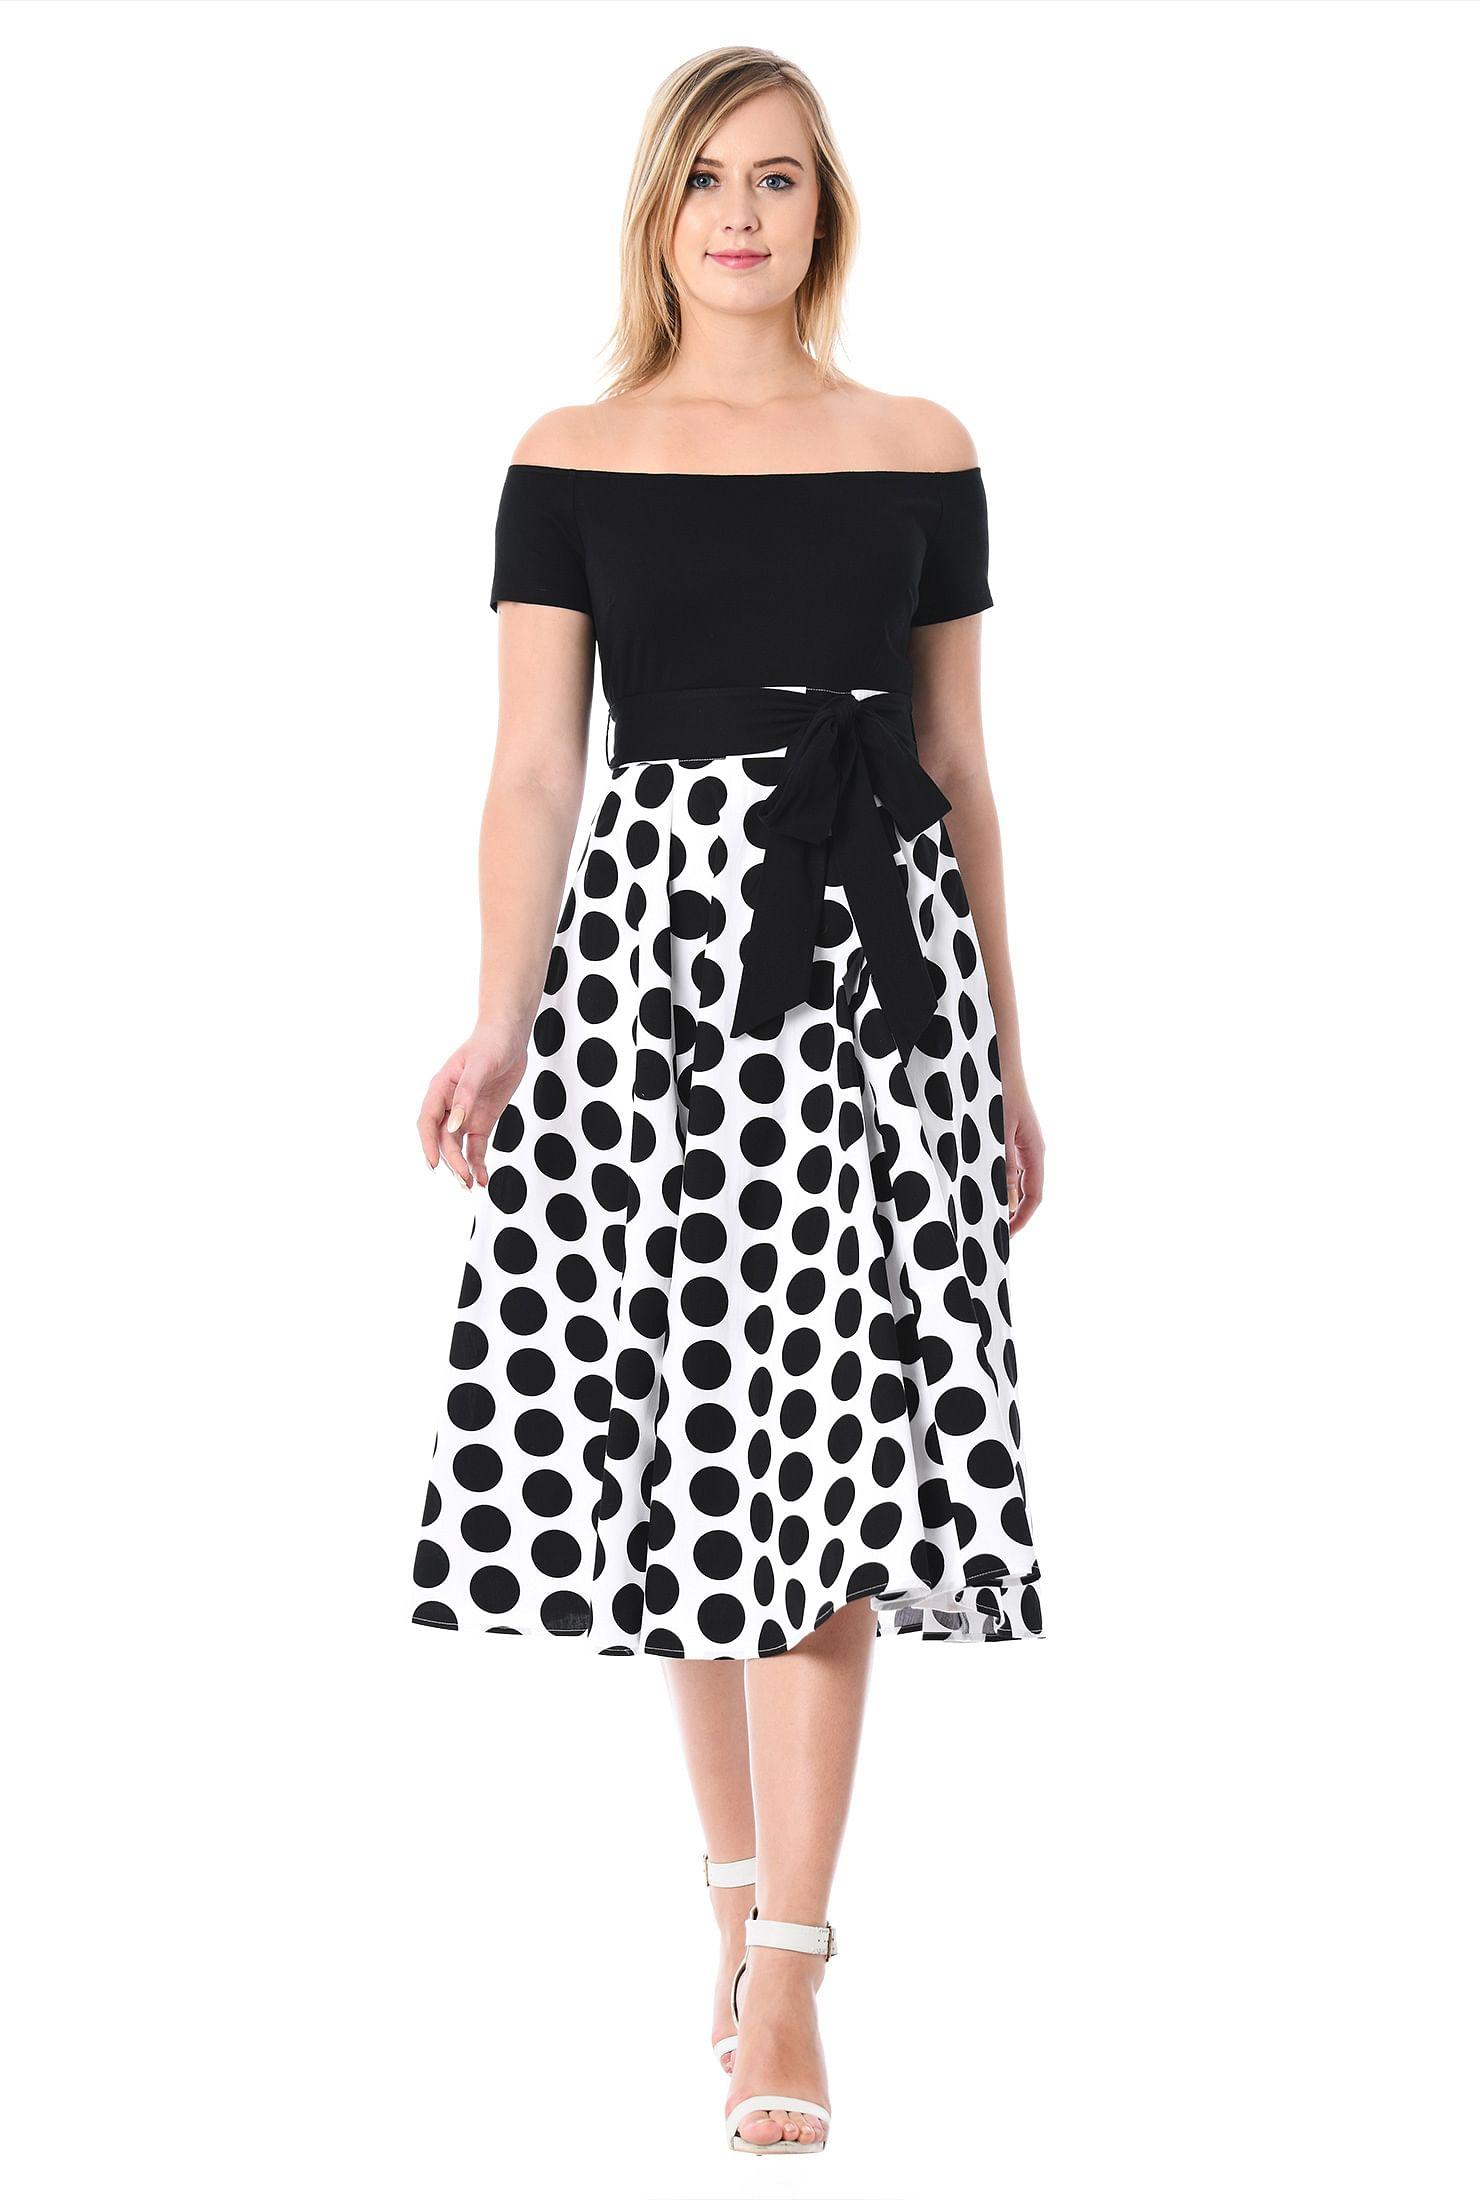 Off The Shoulder Polka Dot Print Mixed Media Dress